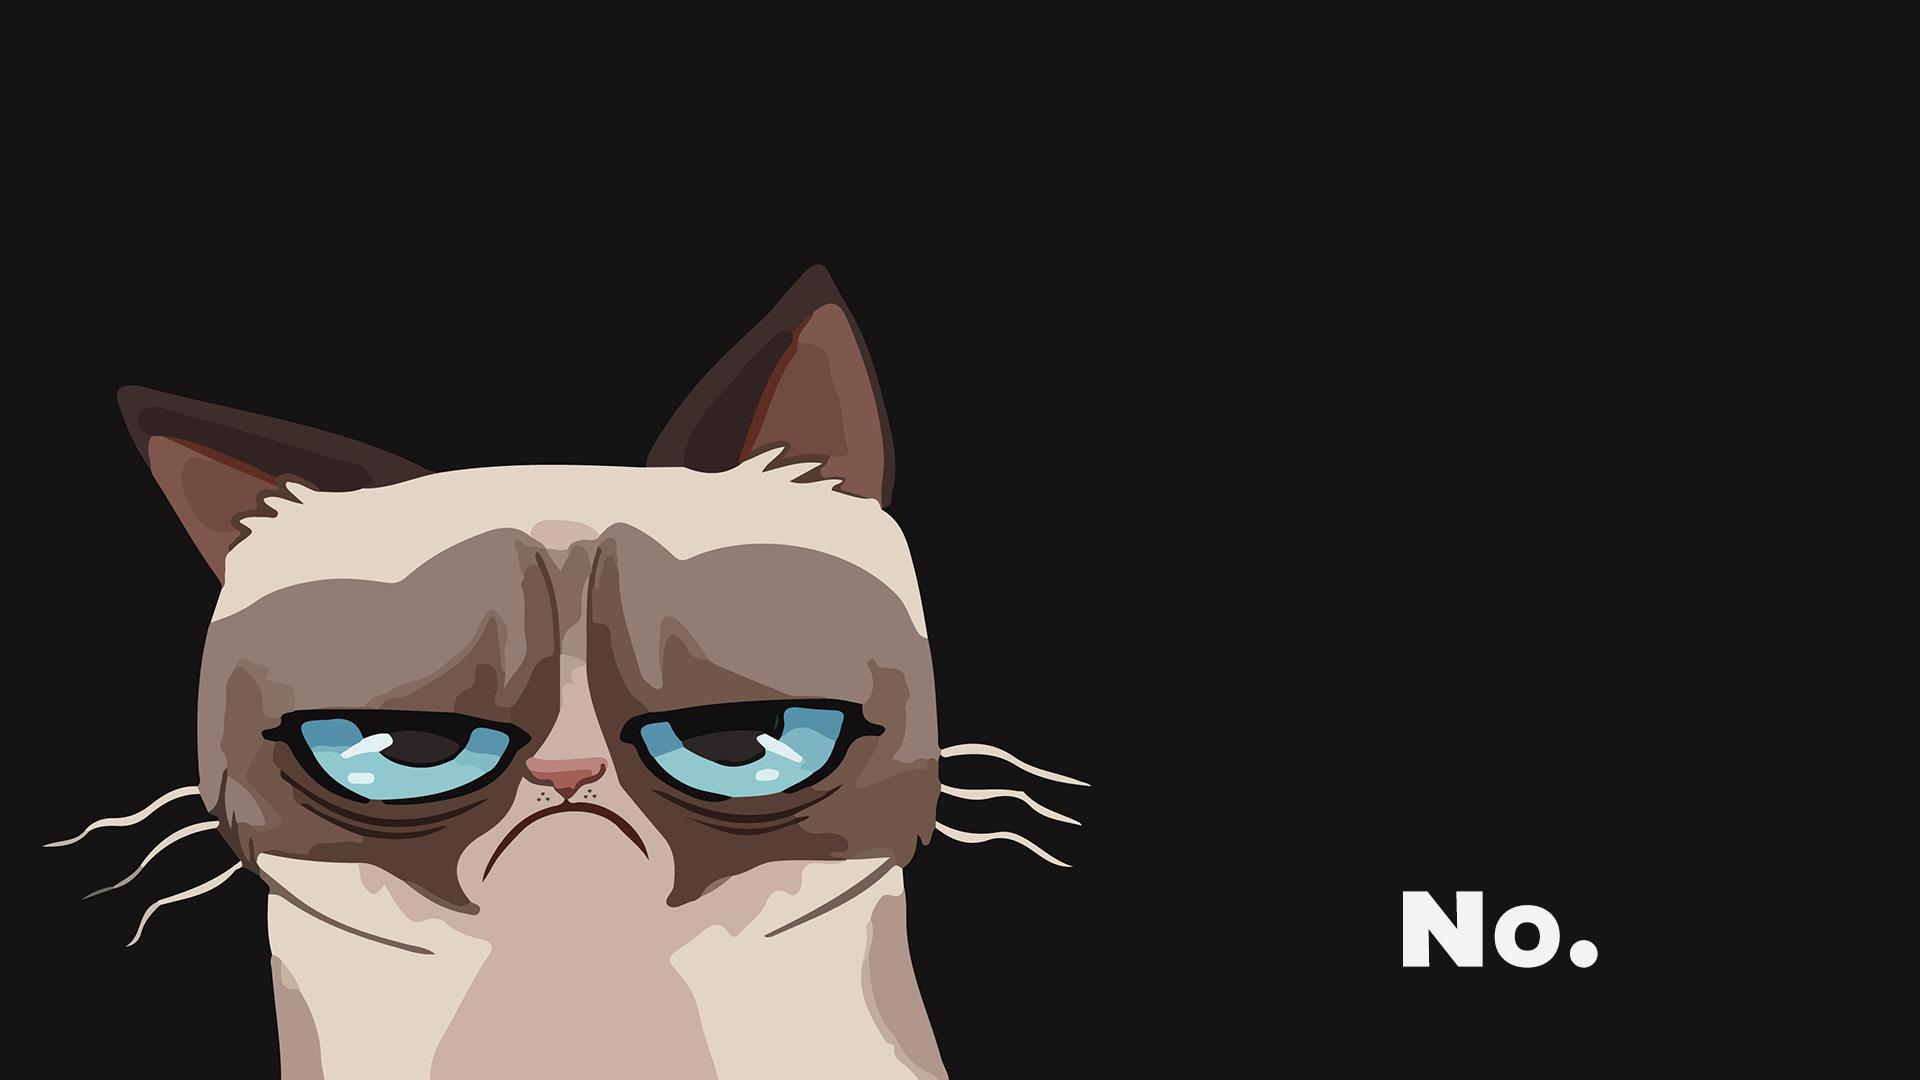 Pin By Tugba Akcay On Grumpy Cat Cat Wallpaper Grumpy Cat Cartoon Cat Background